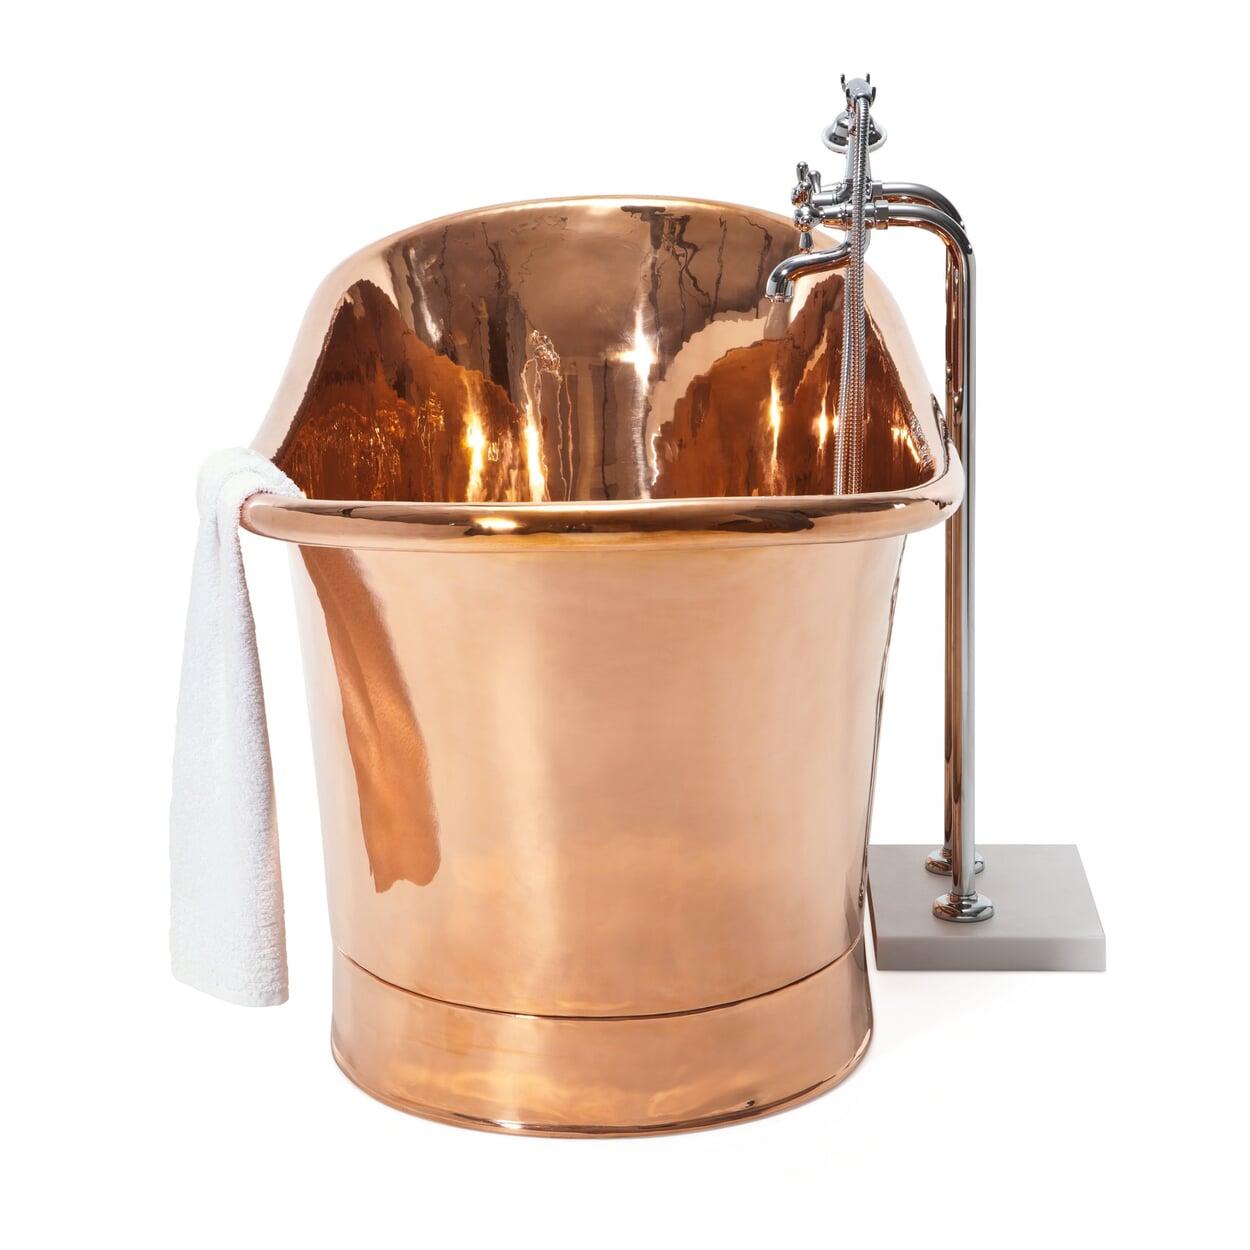 Badewanne Kupfer